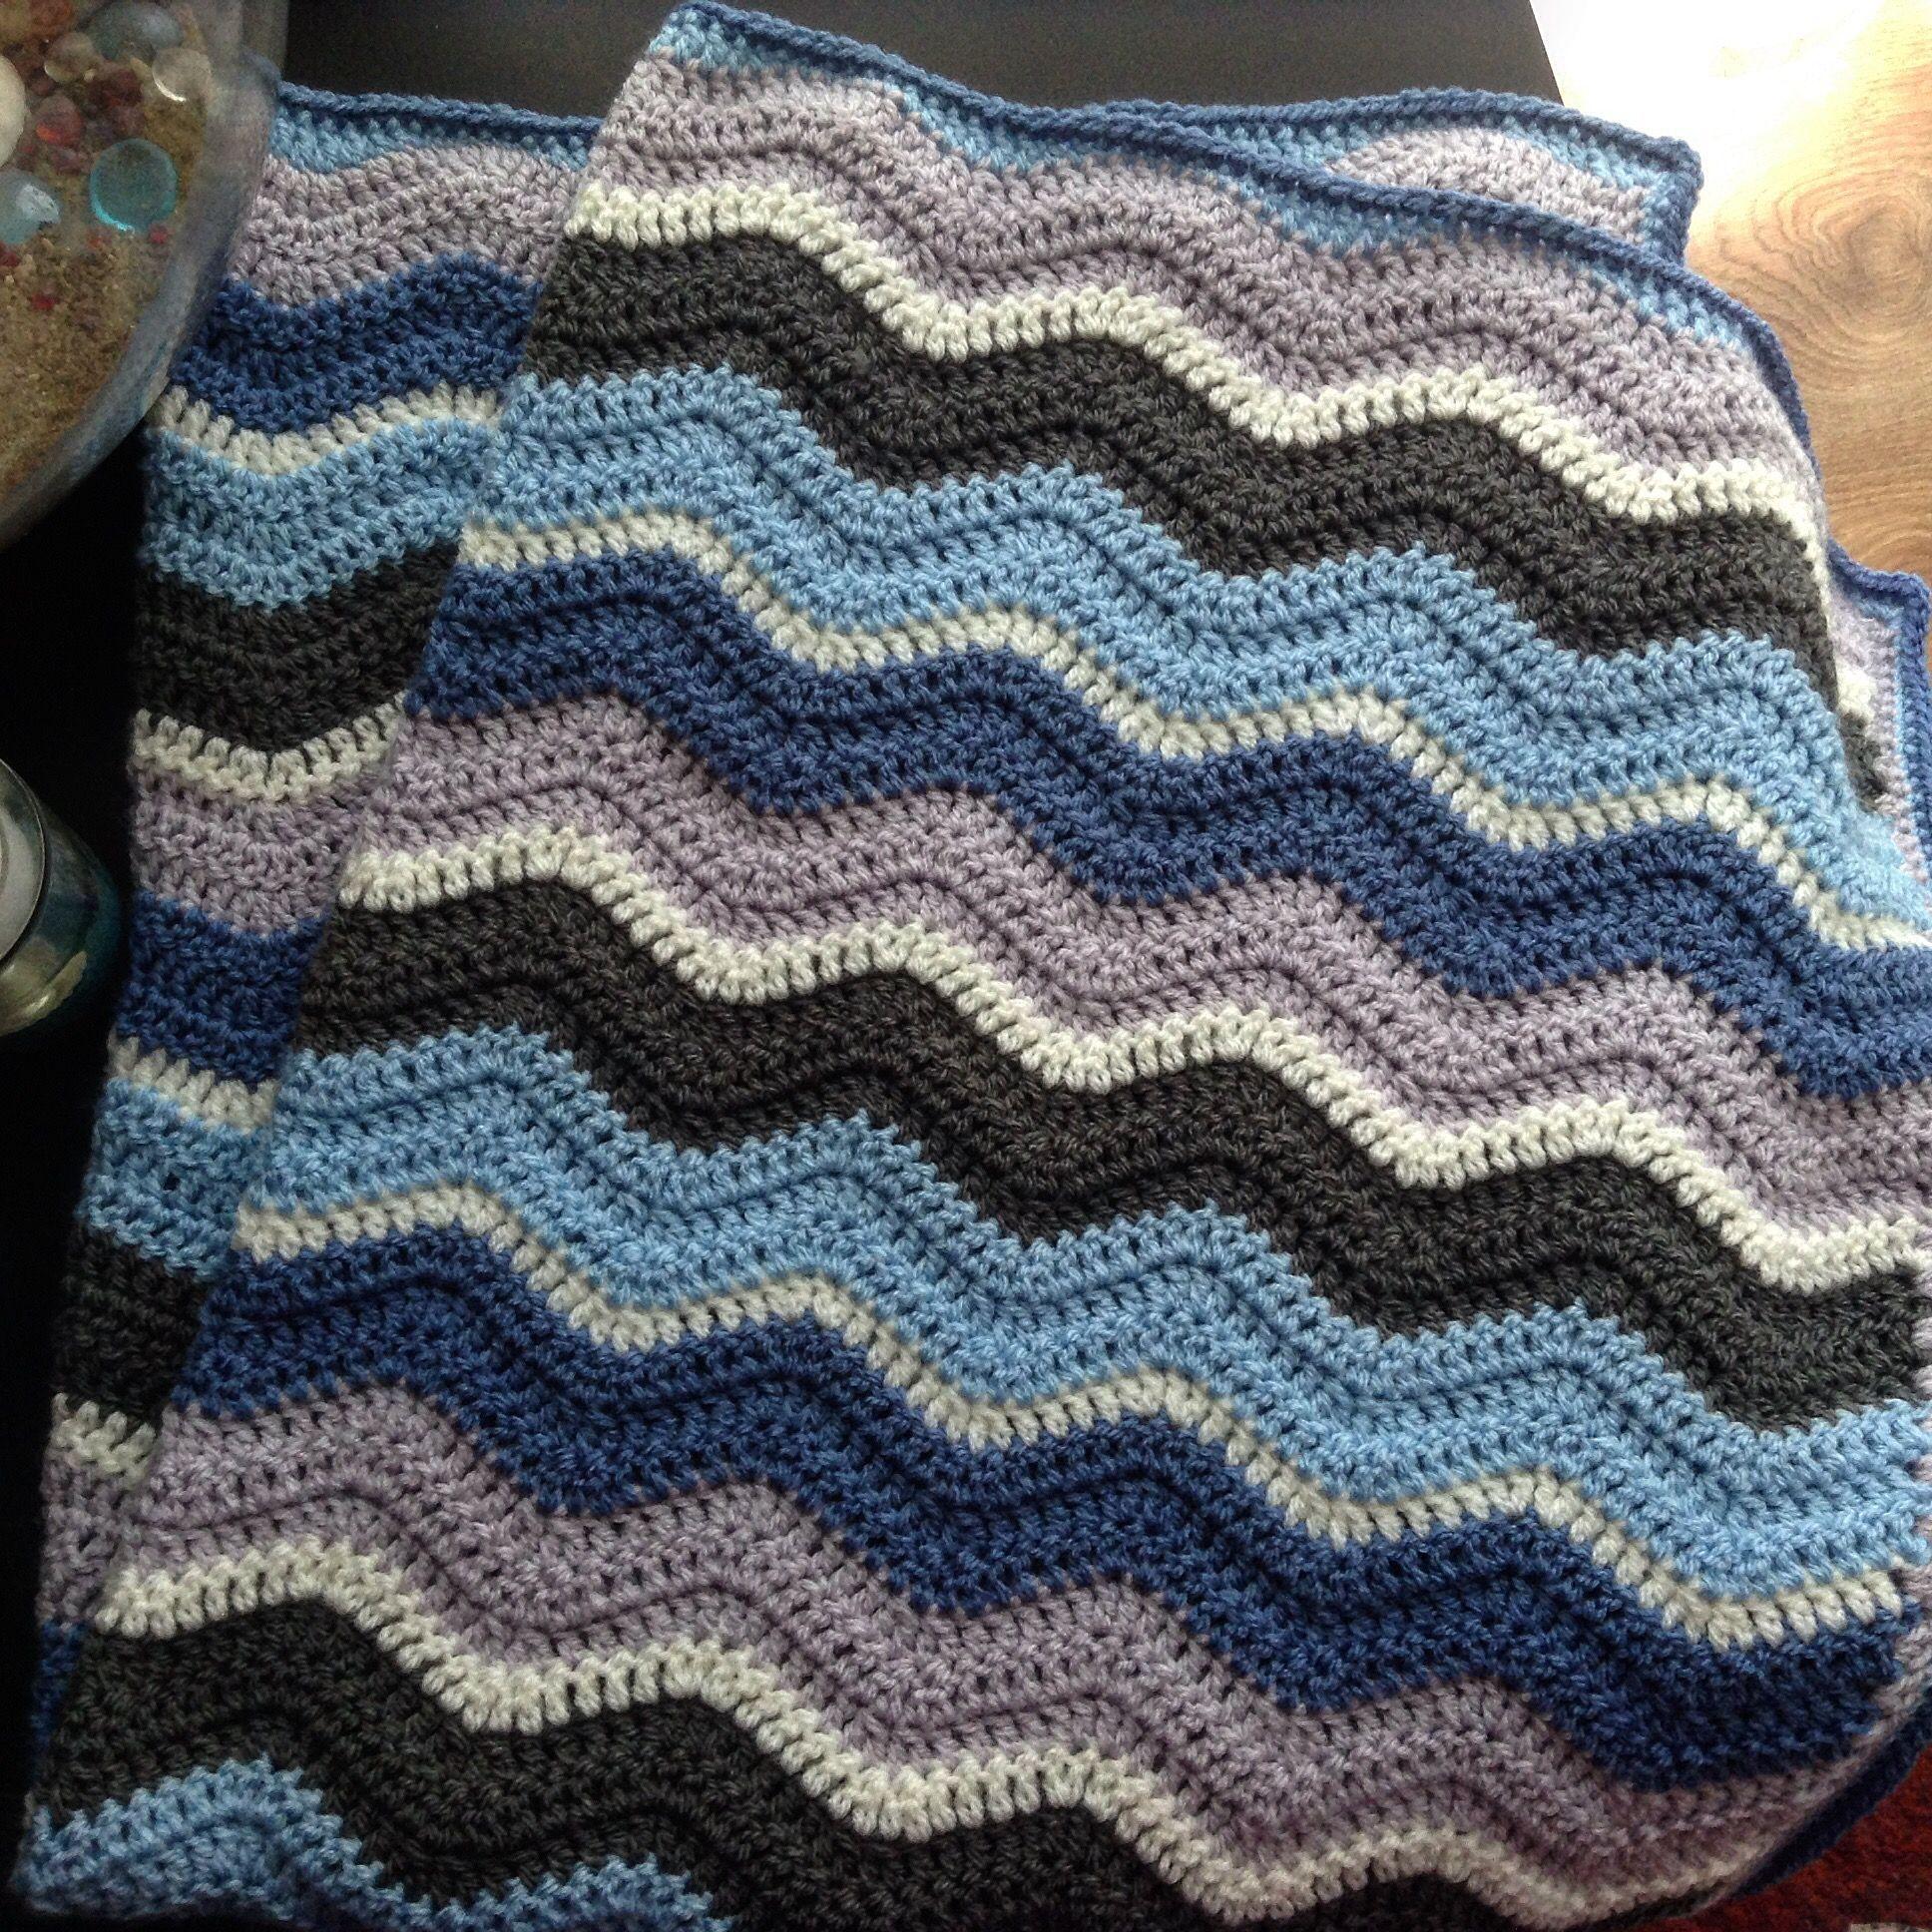 Hand crochet star baby blanket laprobe